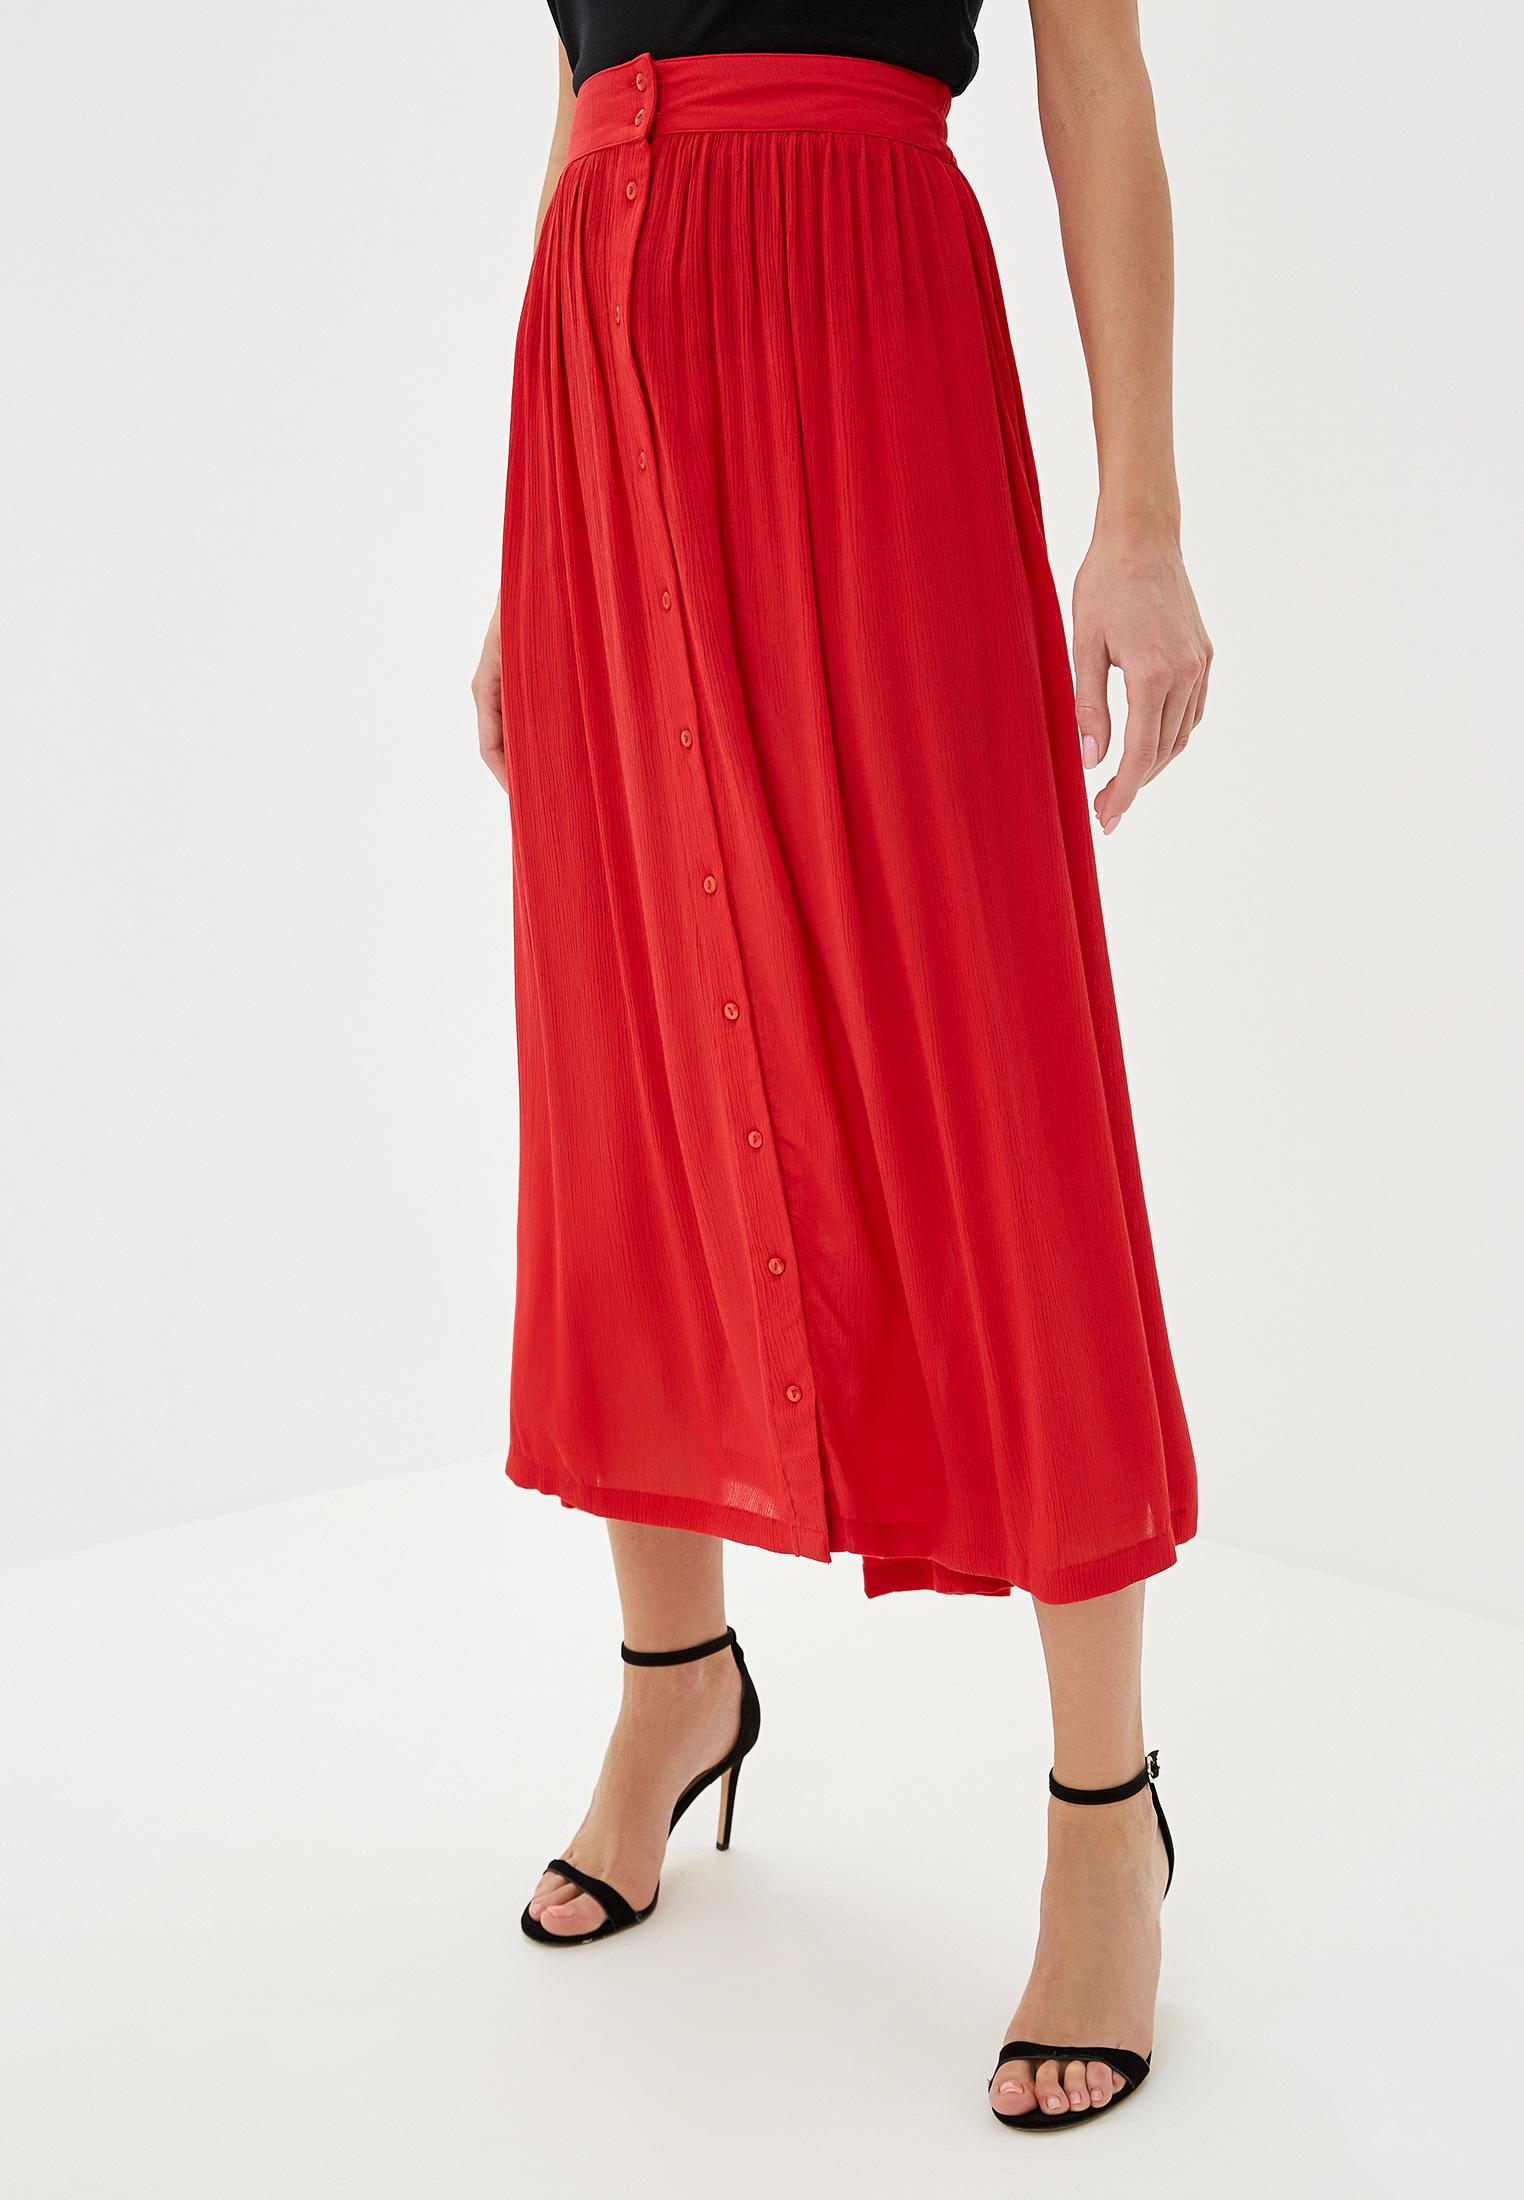 Широкая юбка Vero Moda (Веро Мода) 10216770